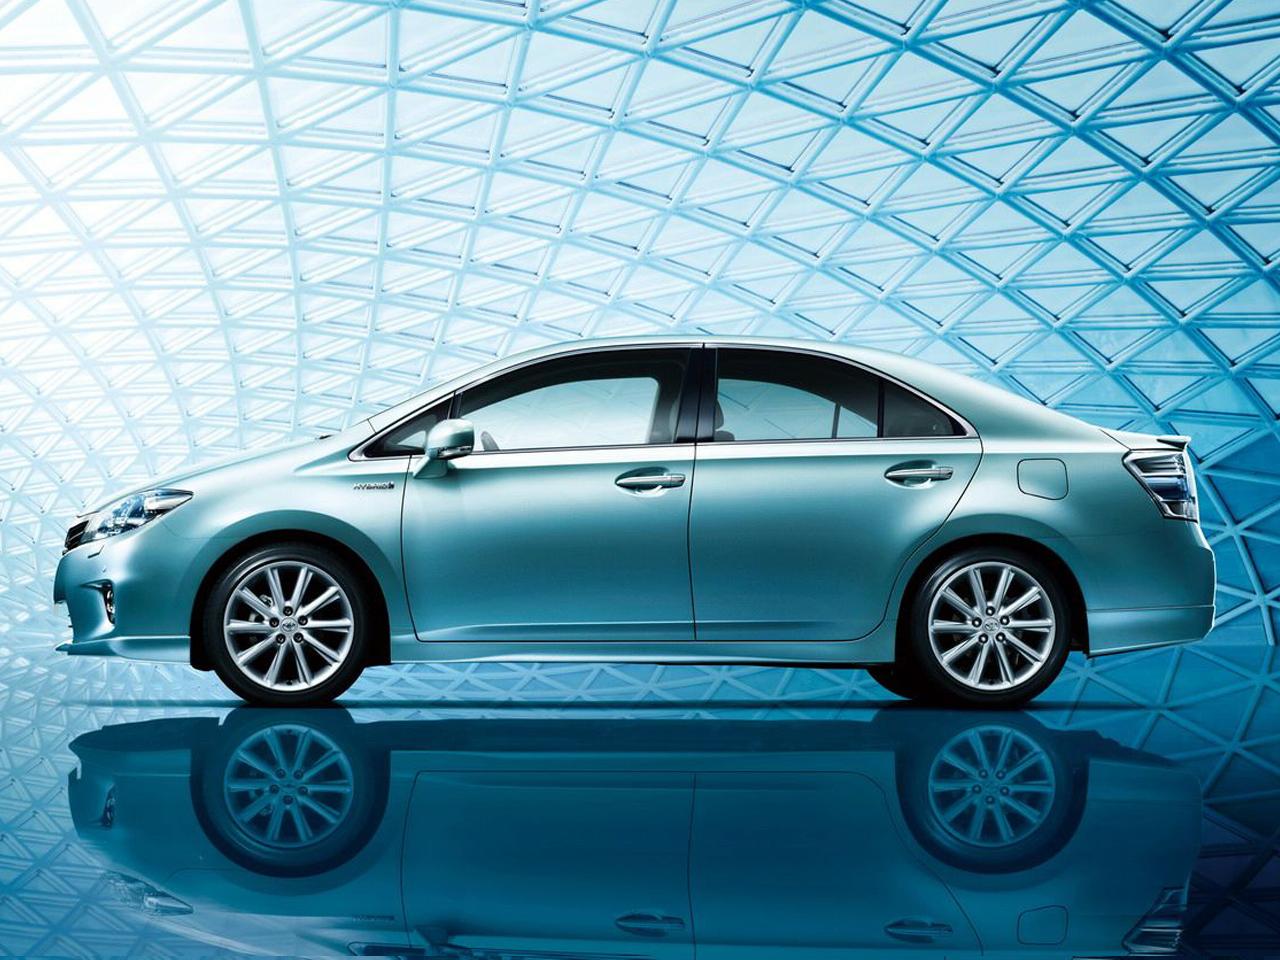 Toyota Sai Photos Photogallery With 13 Pics Carsbase Com